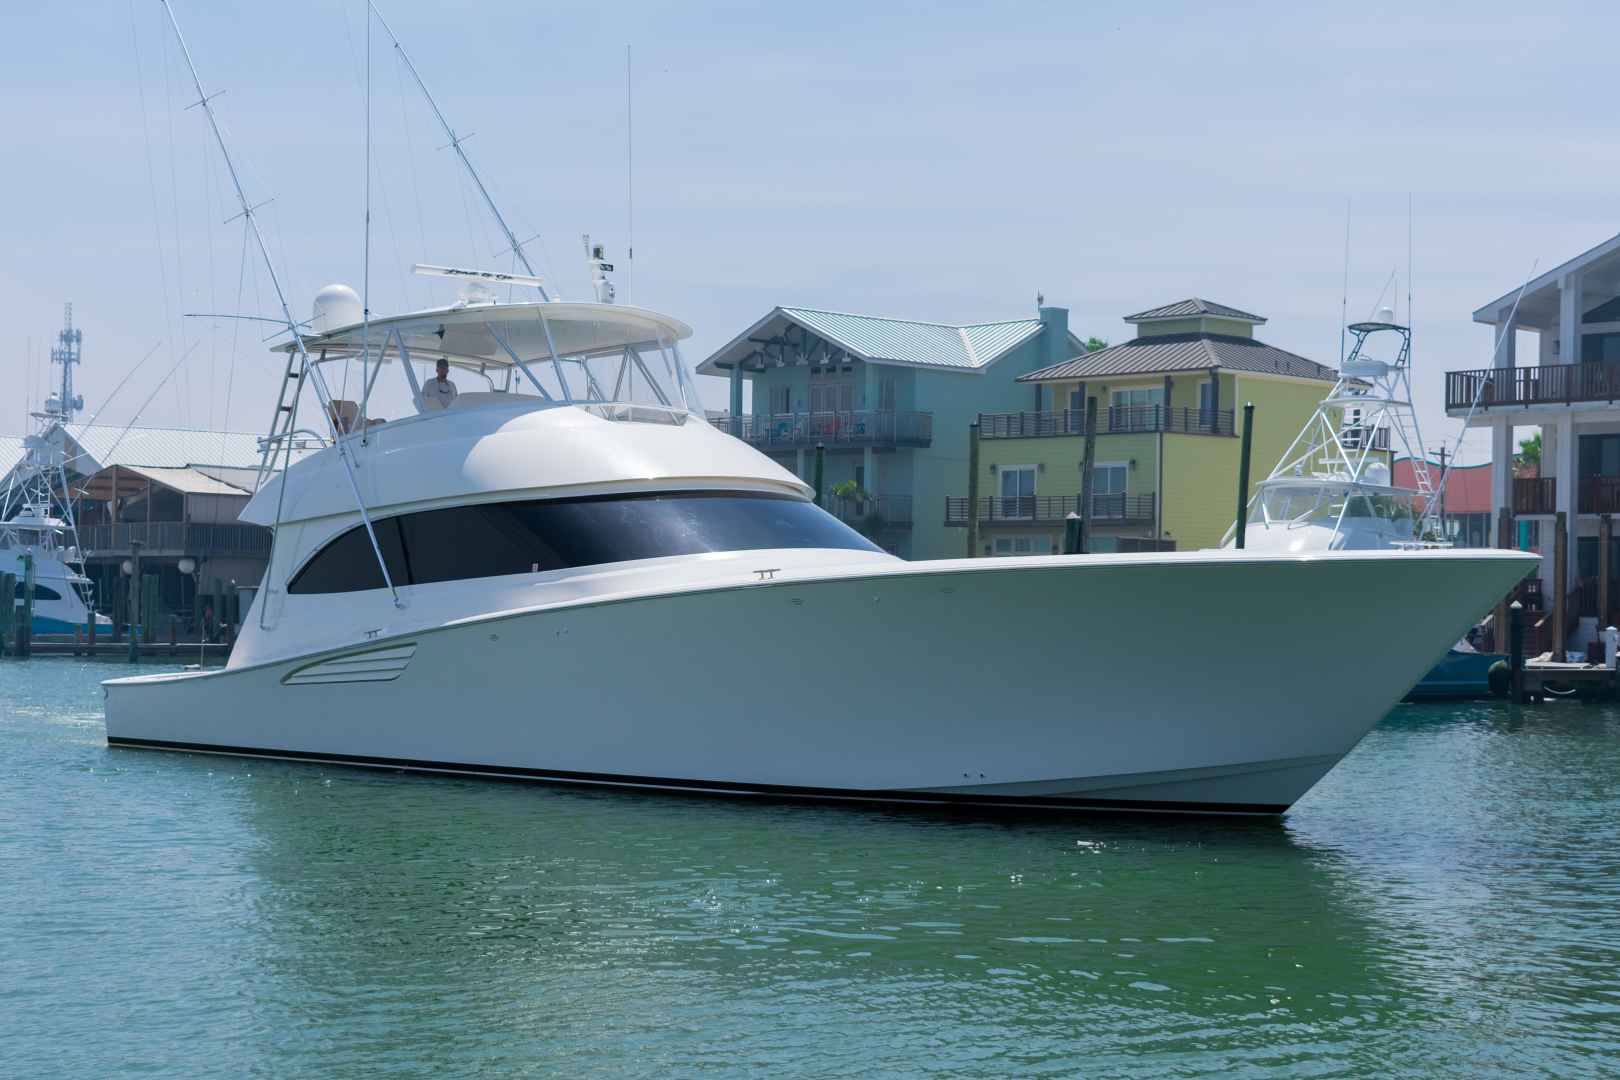 Viking-70 Convertible 2014-Load N Go Port Aransas-Texas-United States-2014 70 Viking Load N Go Starboard (2)-1380604 | Thumbnail